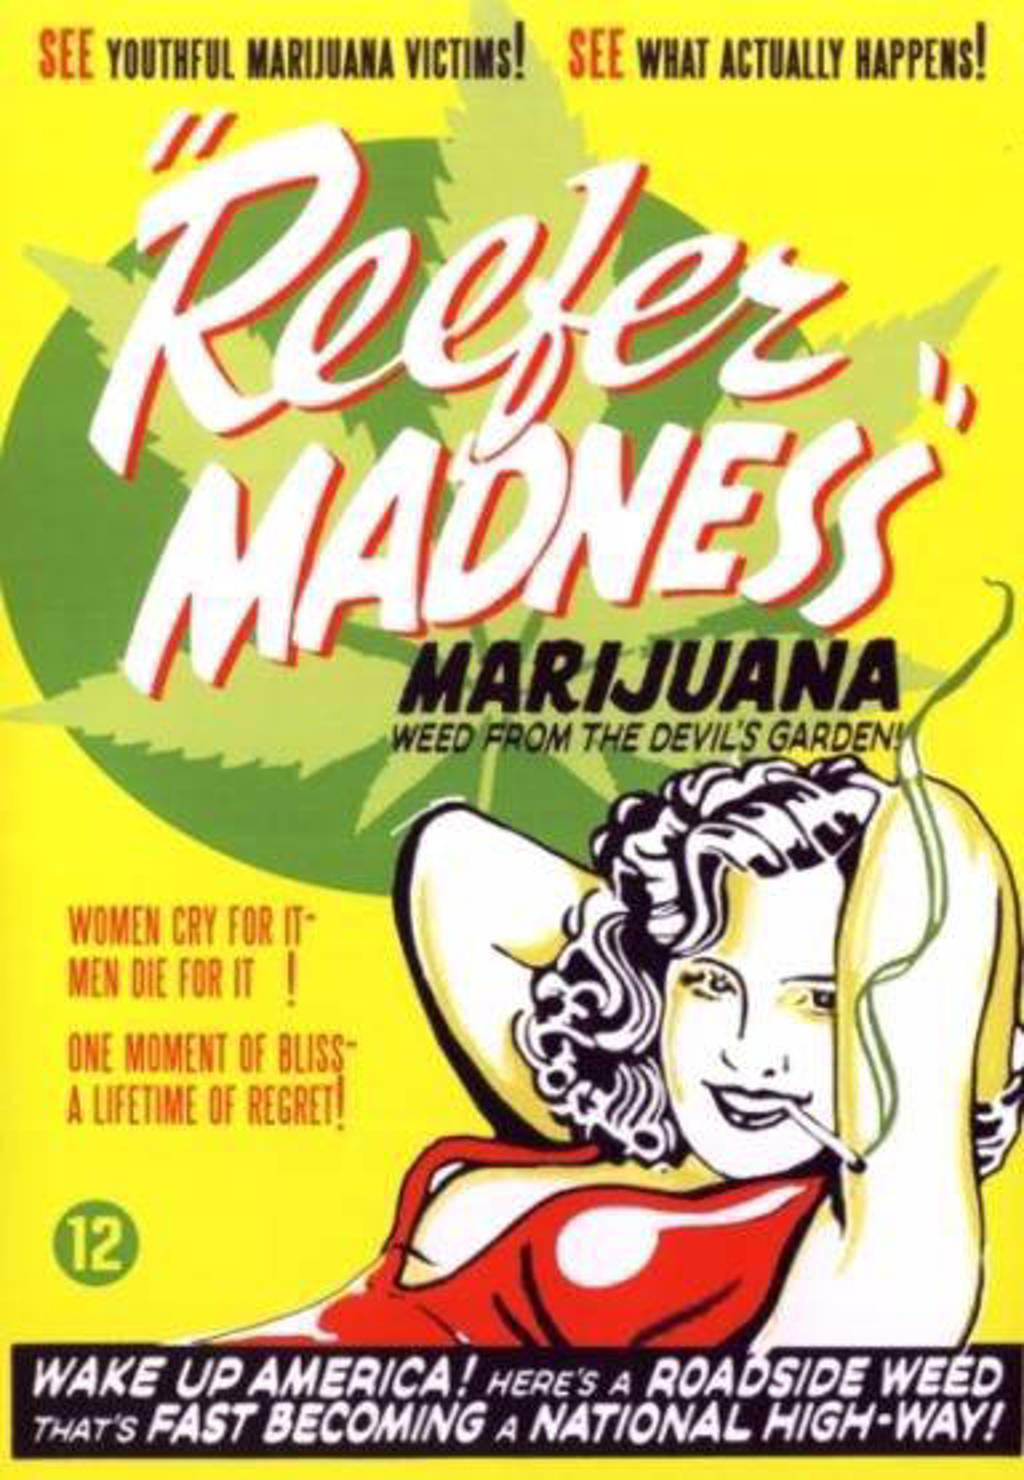 Reefer madness (DVD)